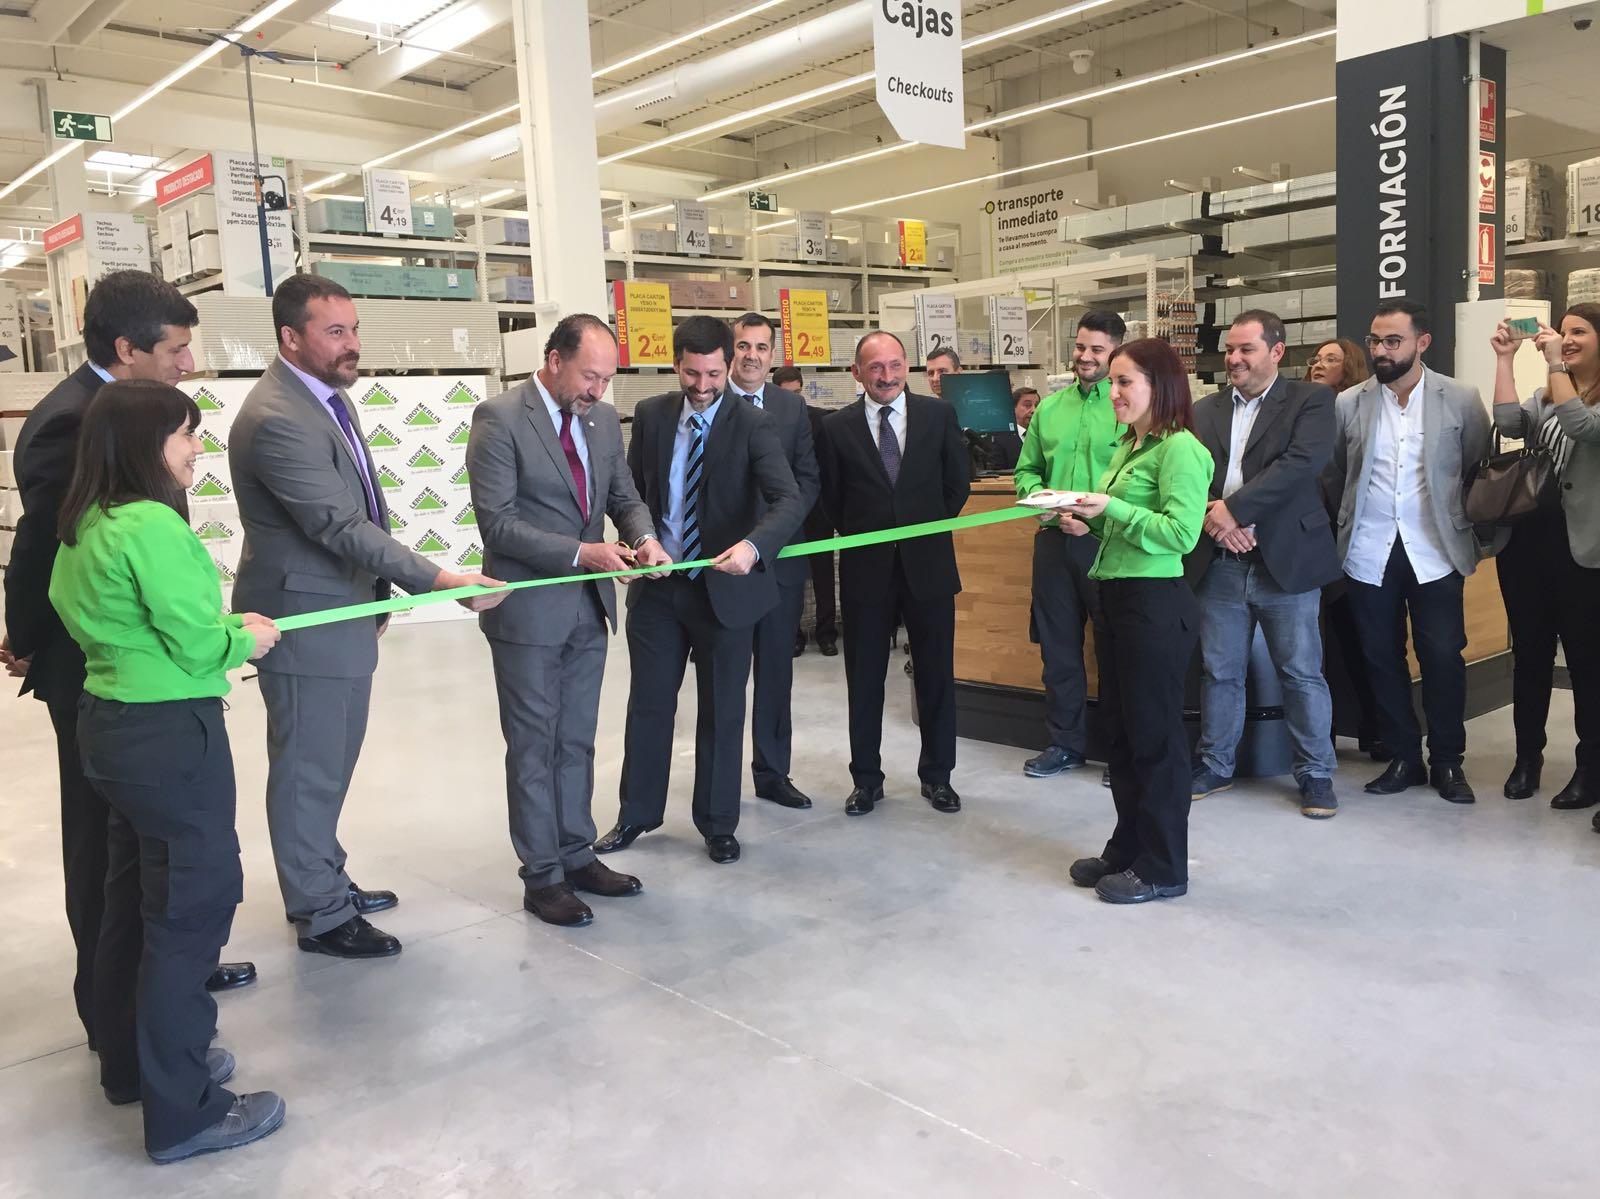 Leroy Merlin Opens New Building Supplies Store On Orihuela